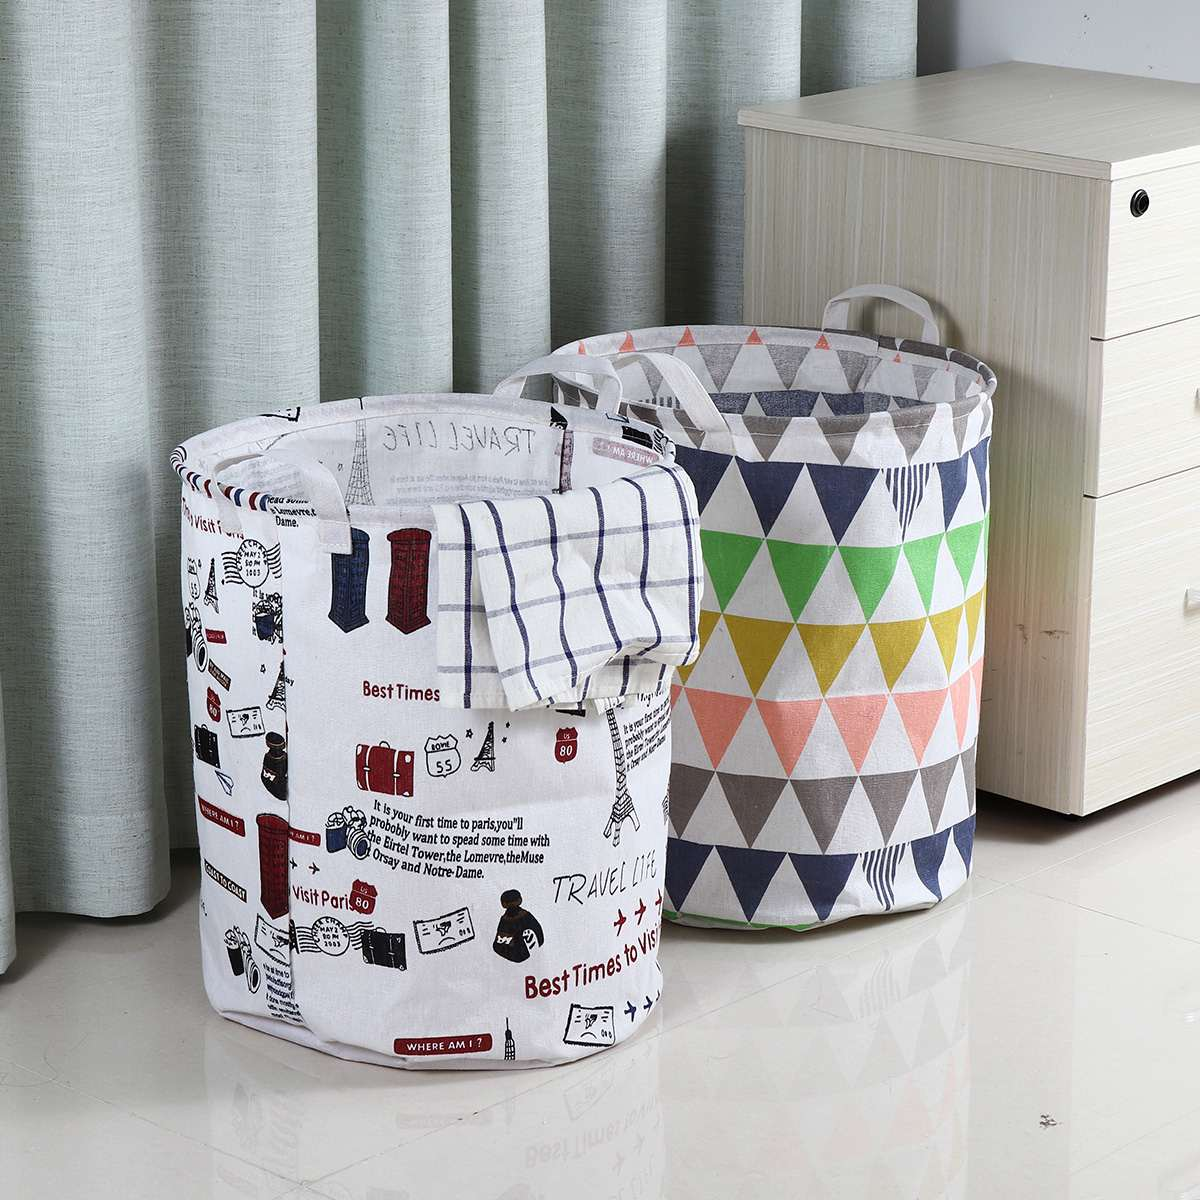 Foldable Laundry Basket Large Capacity Waterproof Durable Cotton Linen Clothes Laundry Basket Hamper Book Storage Organizer Bag